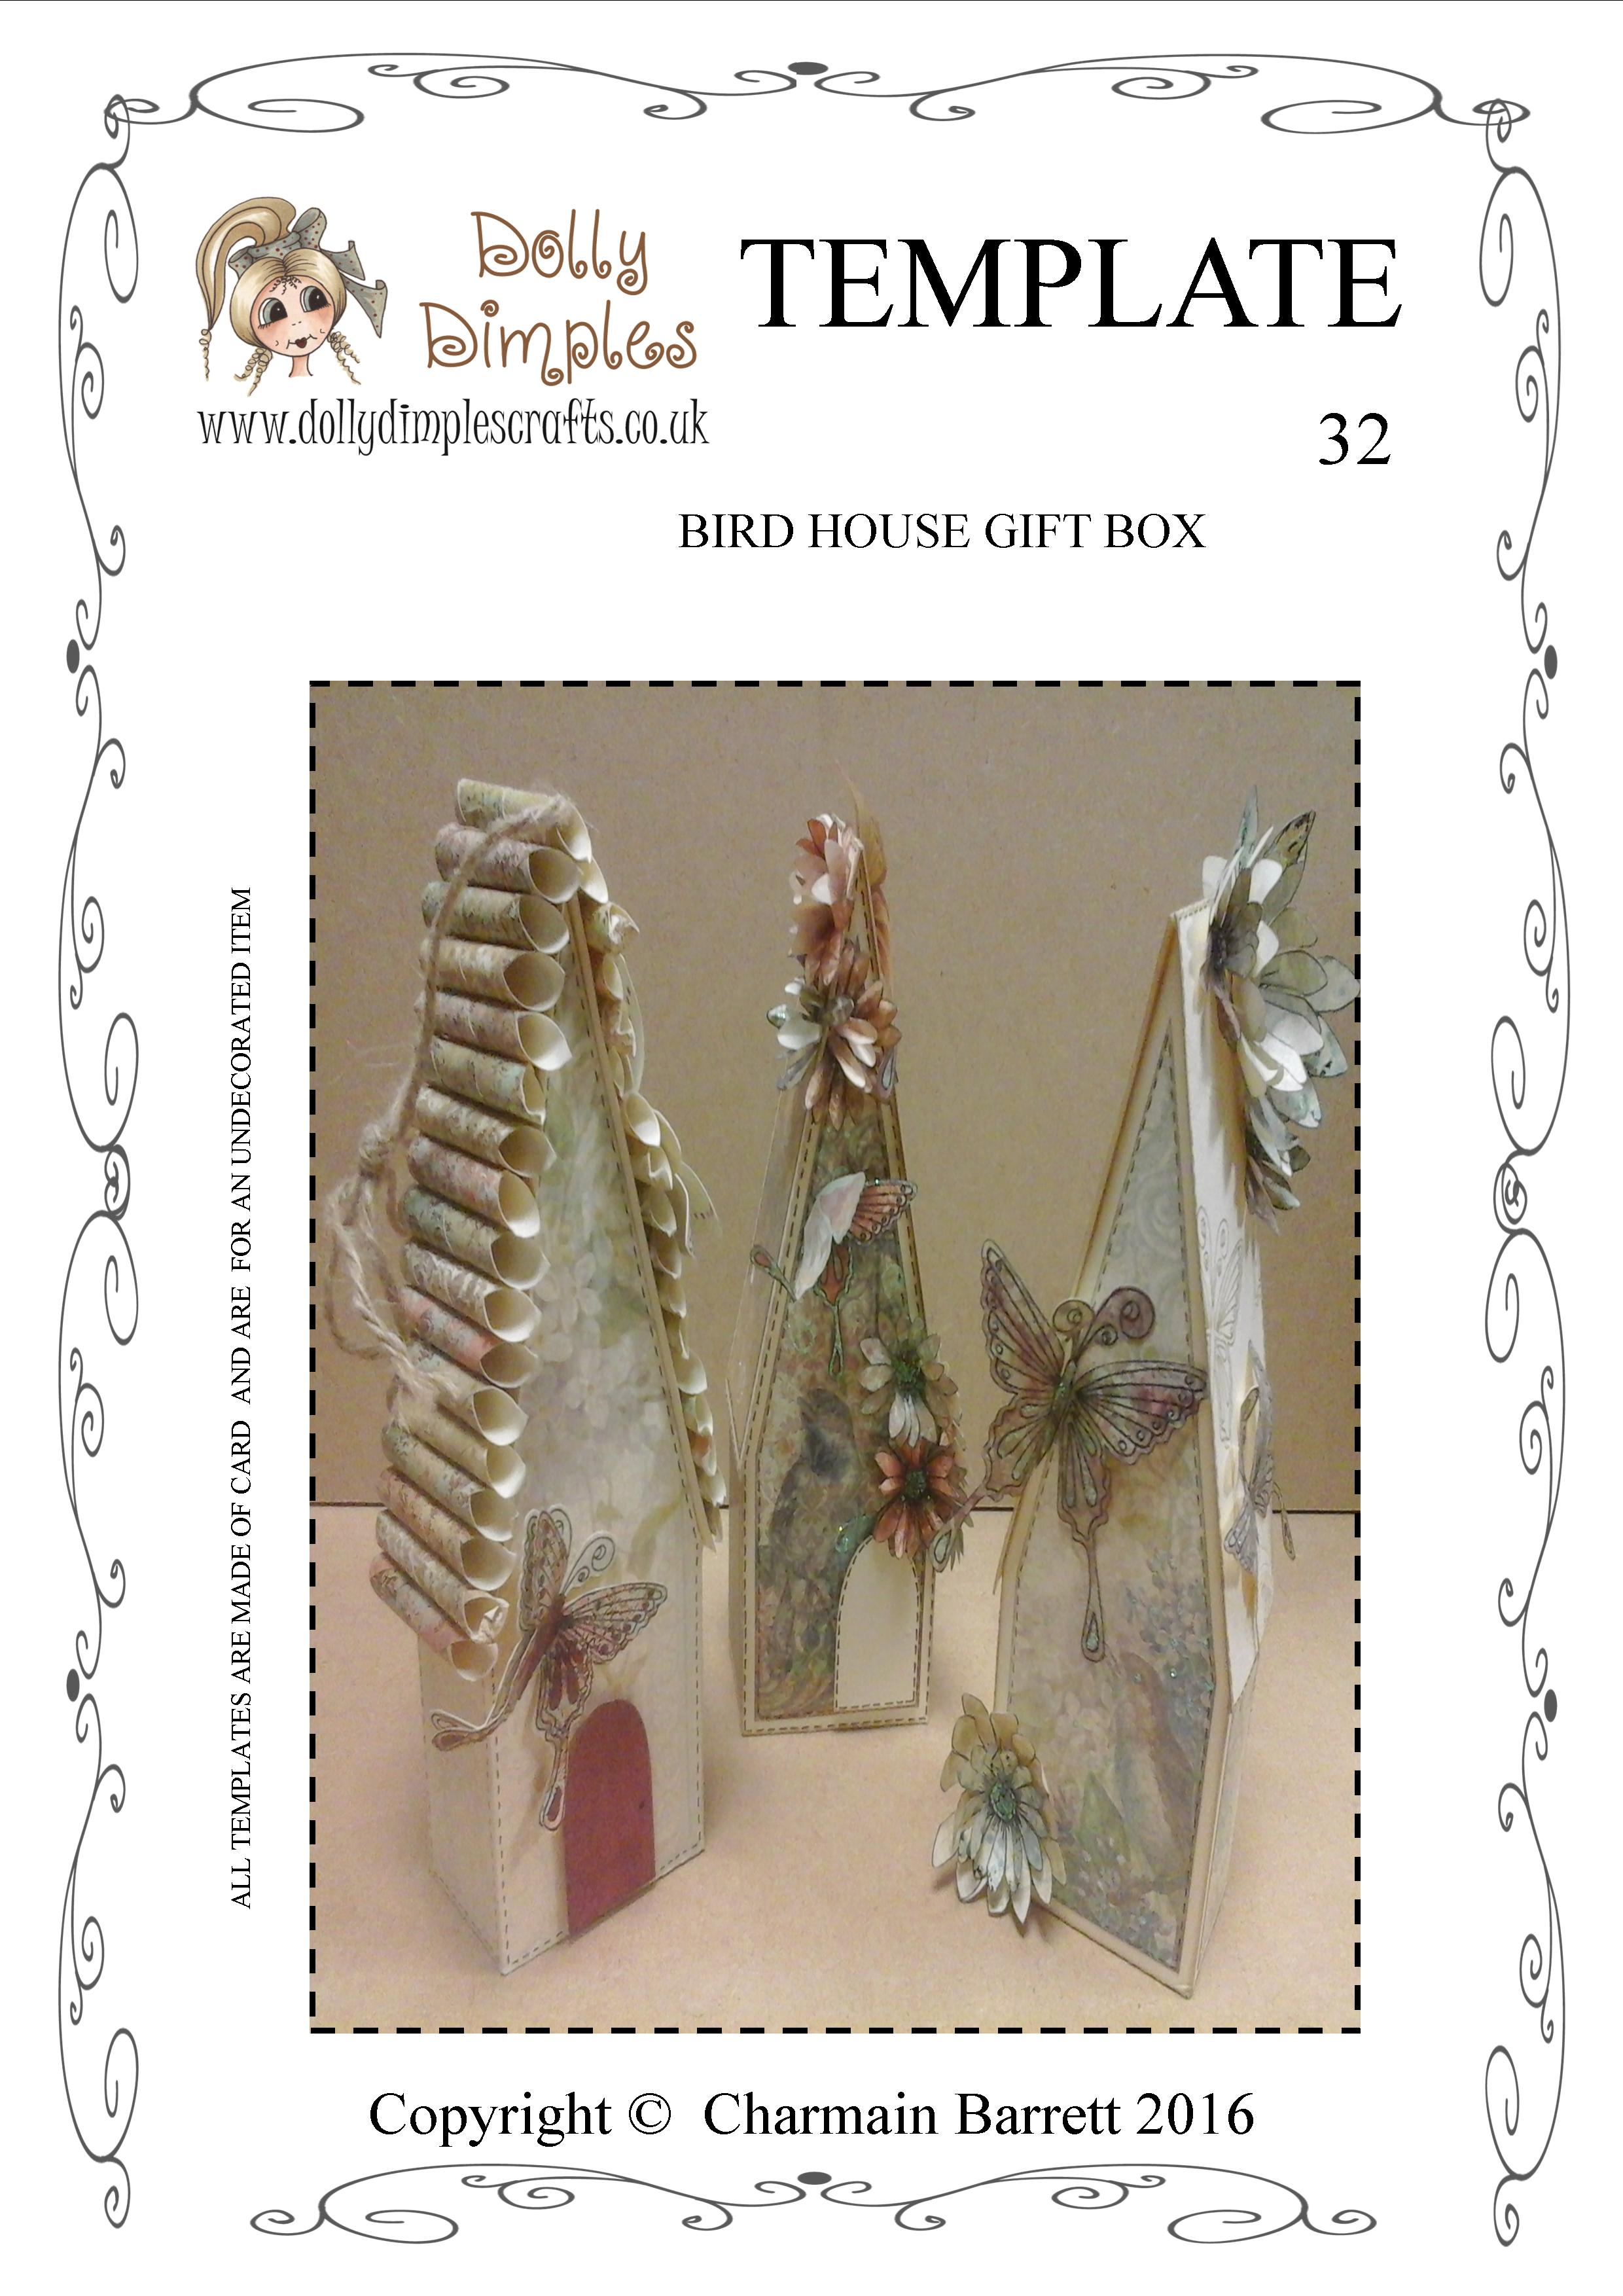 Bird House Gift Box template